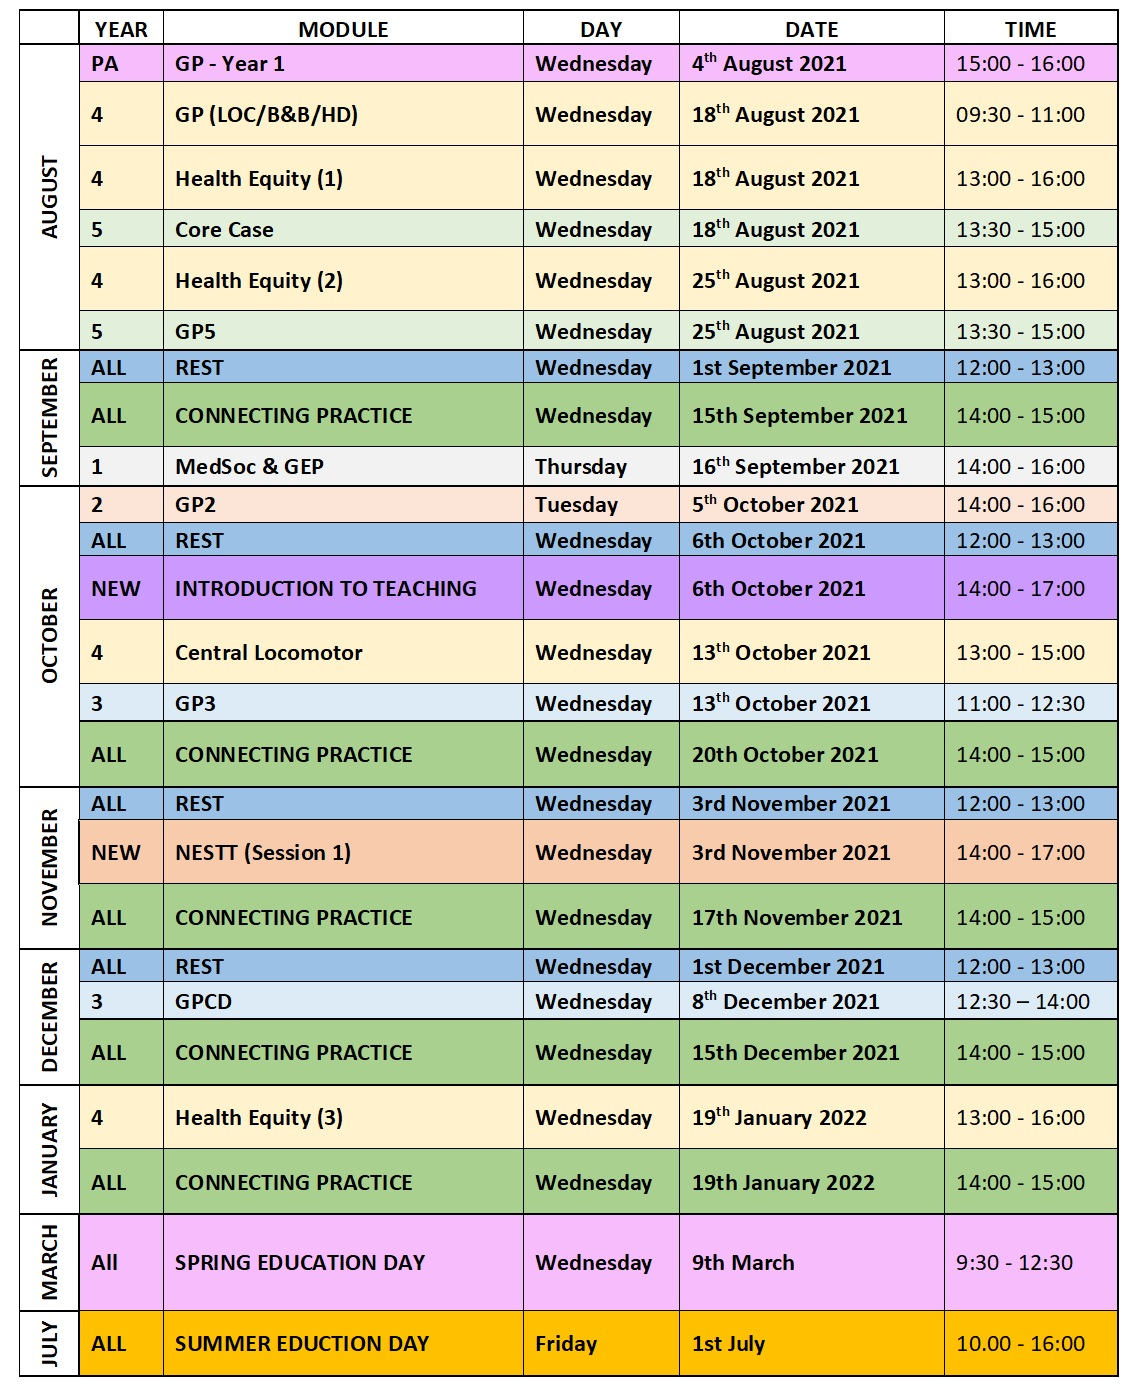 CBME Event dates 2021-22